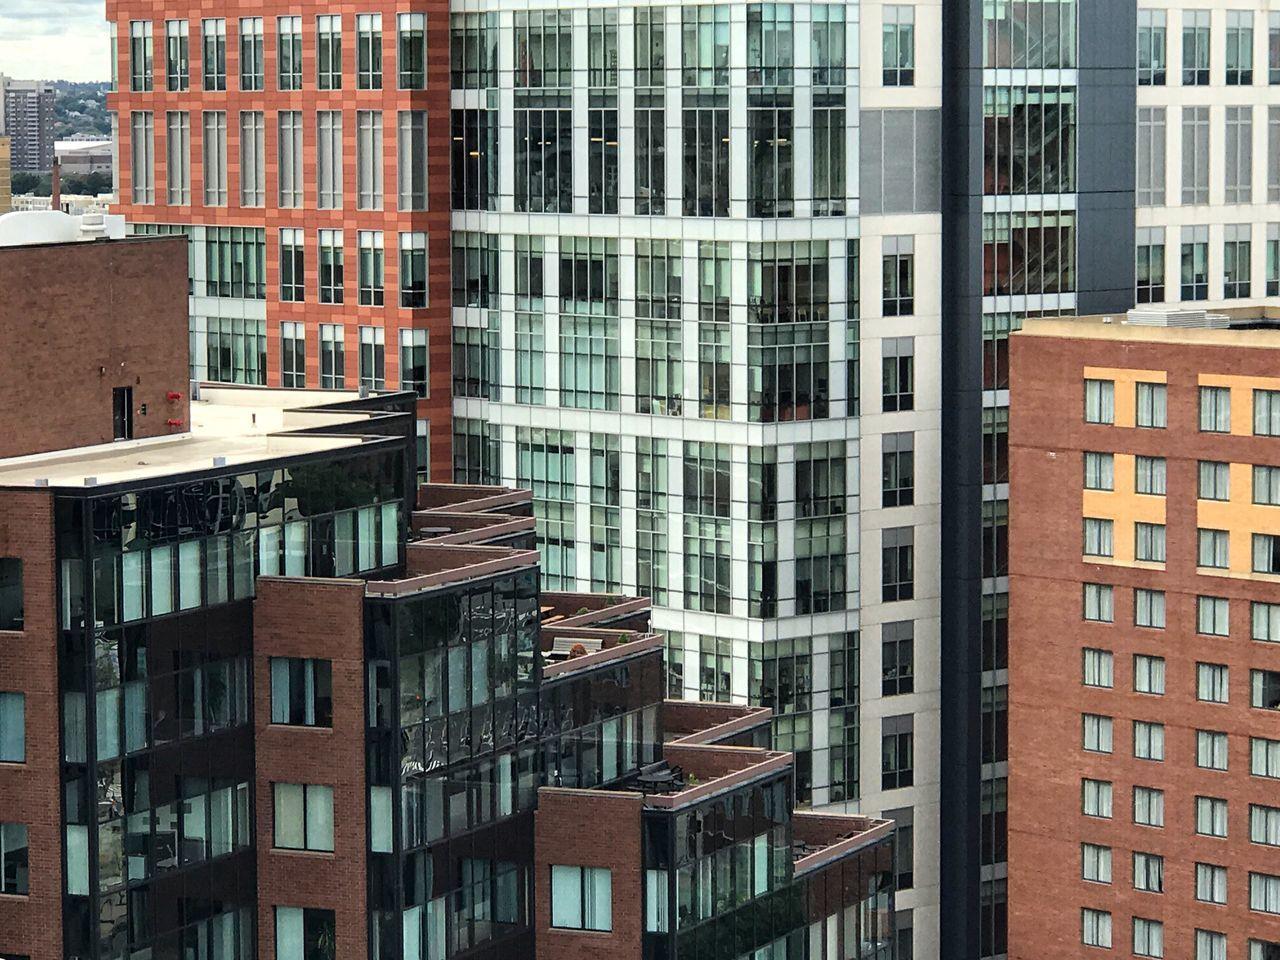 Beautiful stock photos of feuer, window, building exterior, built structure, city